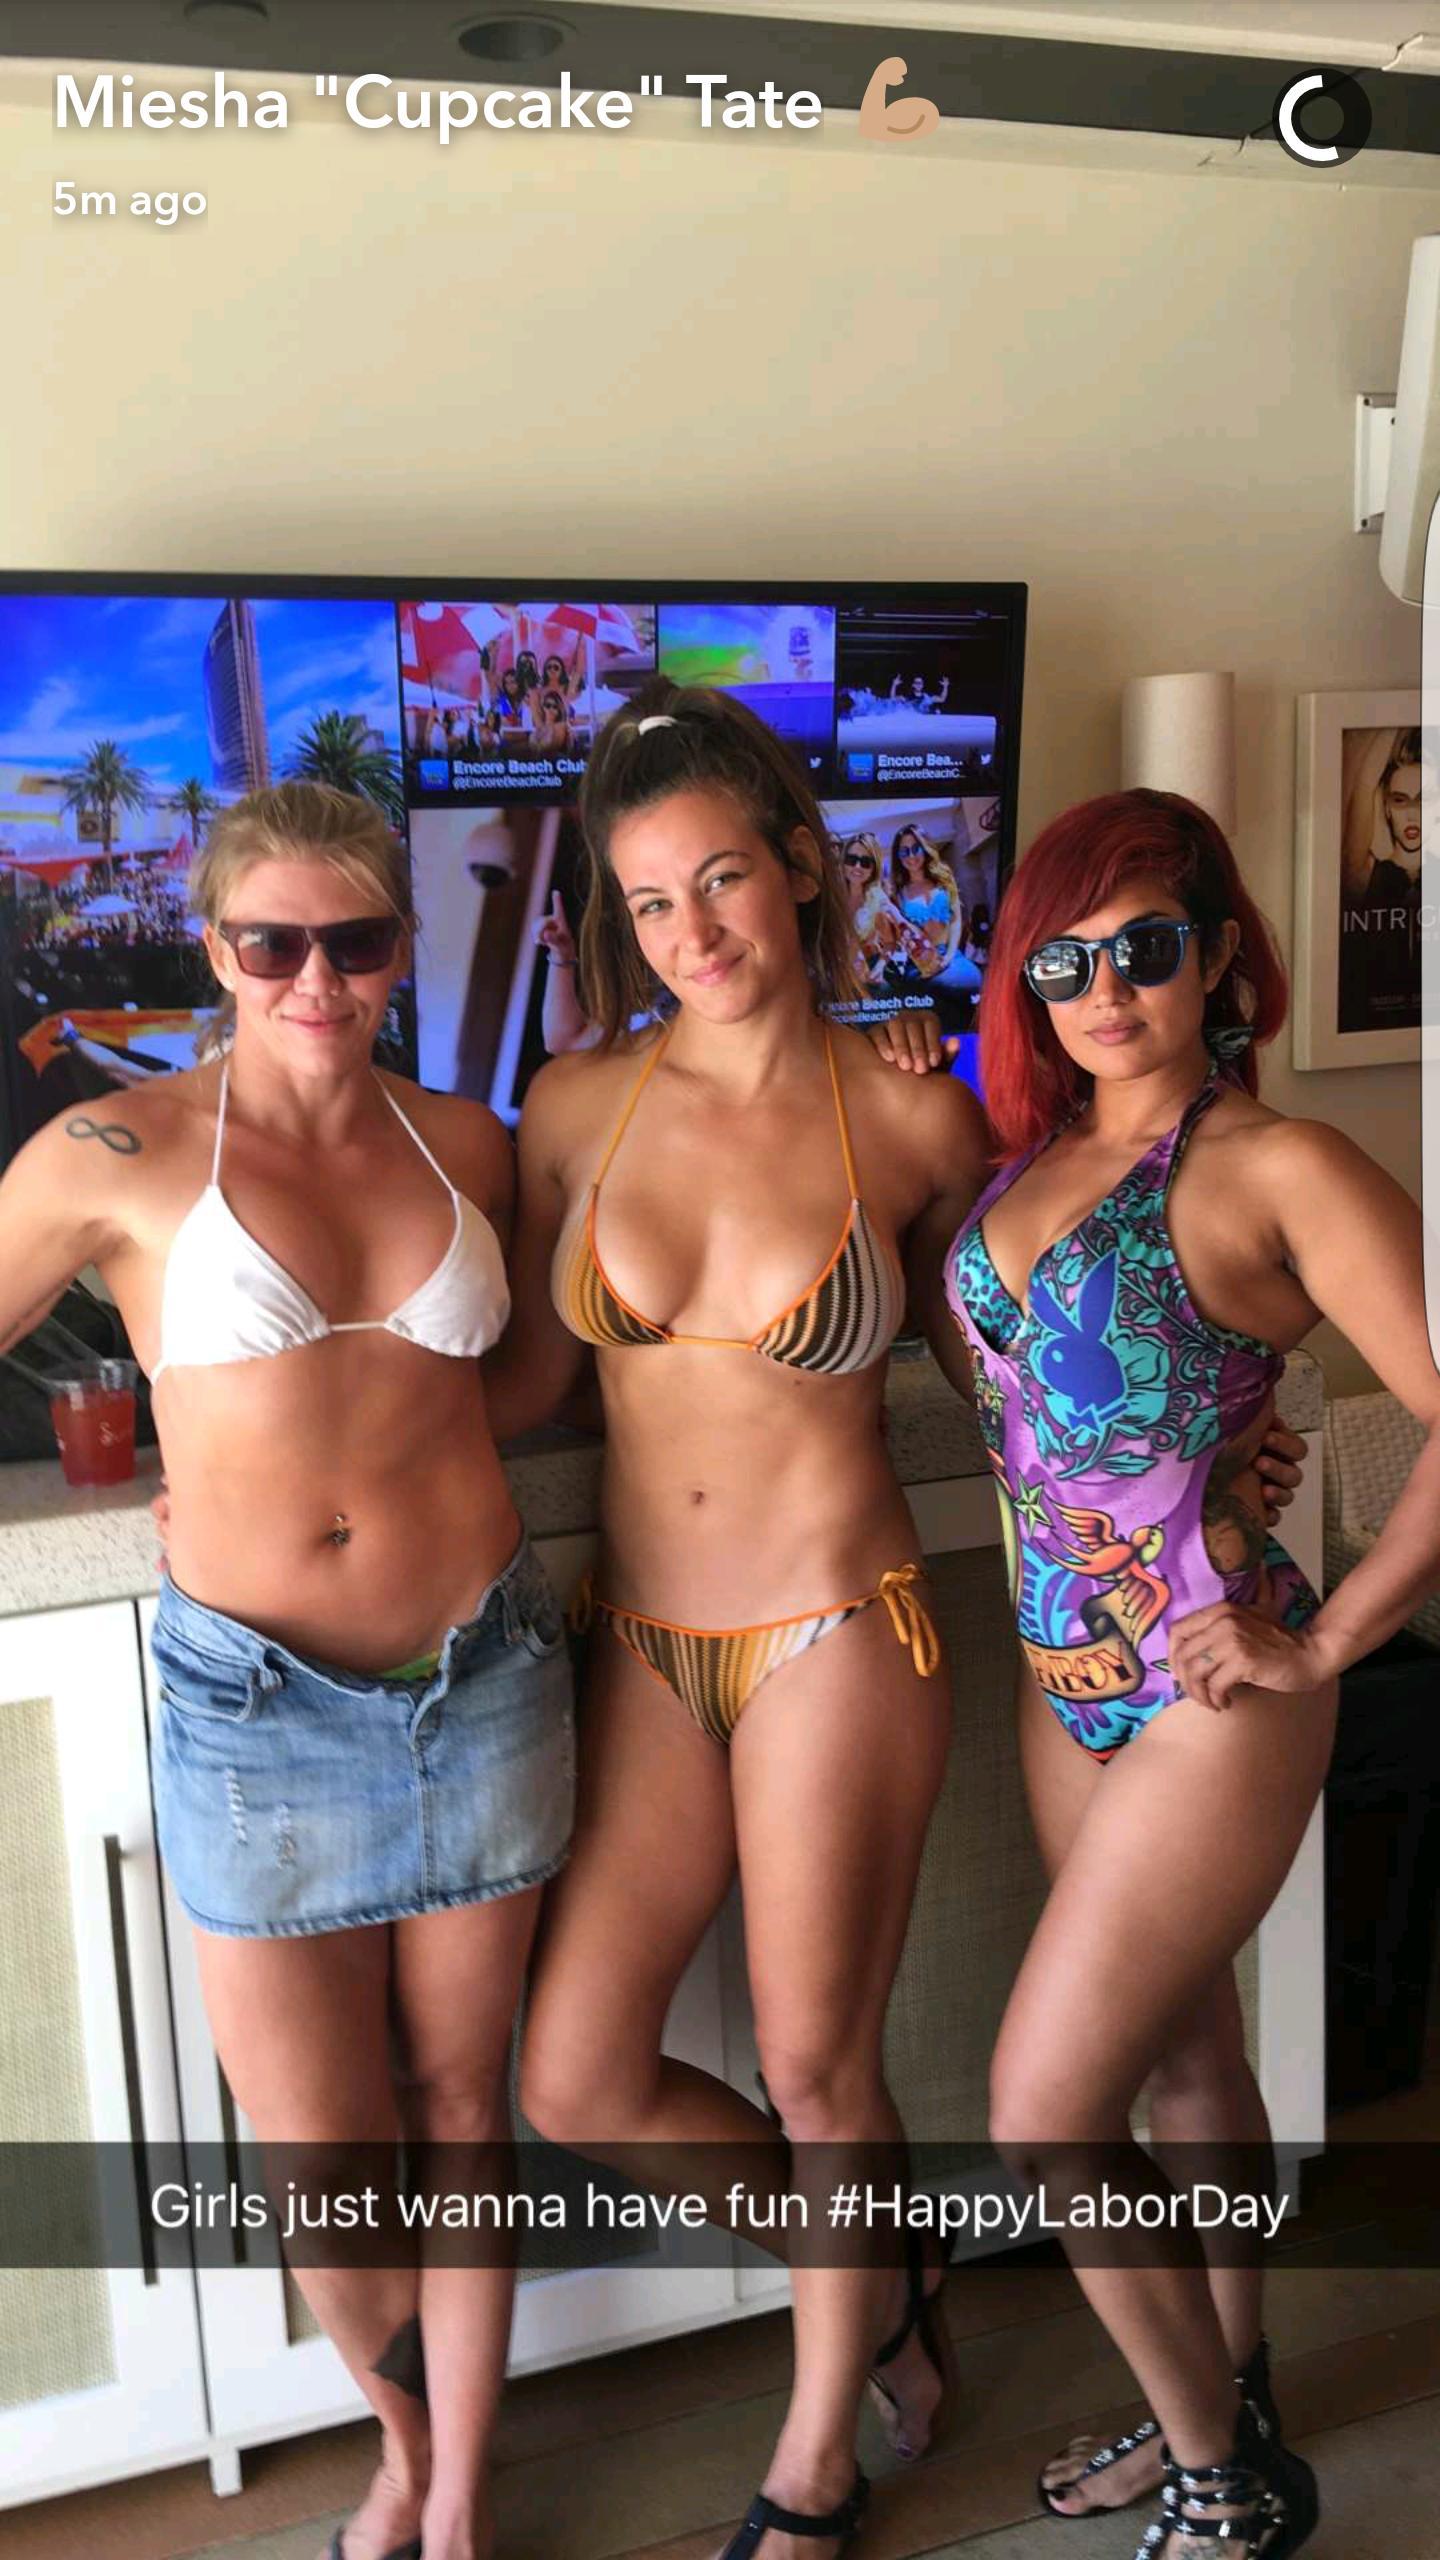 Olivier brauman,Anja konstantinova tangent magazine 8 by emmanuel giraud mq photo shoot Porno gallery Hannah ferguson topless nude beach wurth calender 2019,Miley Cyrus Role Modeling Some Short Shorts